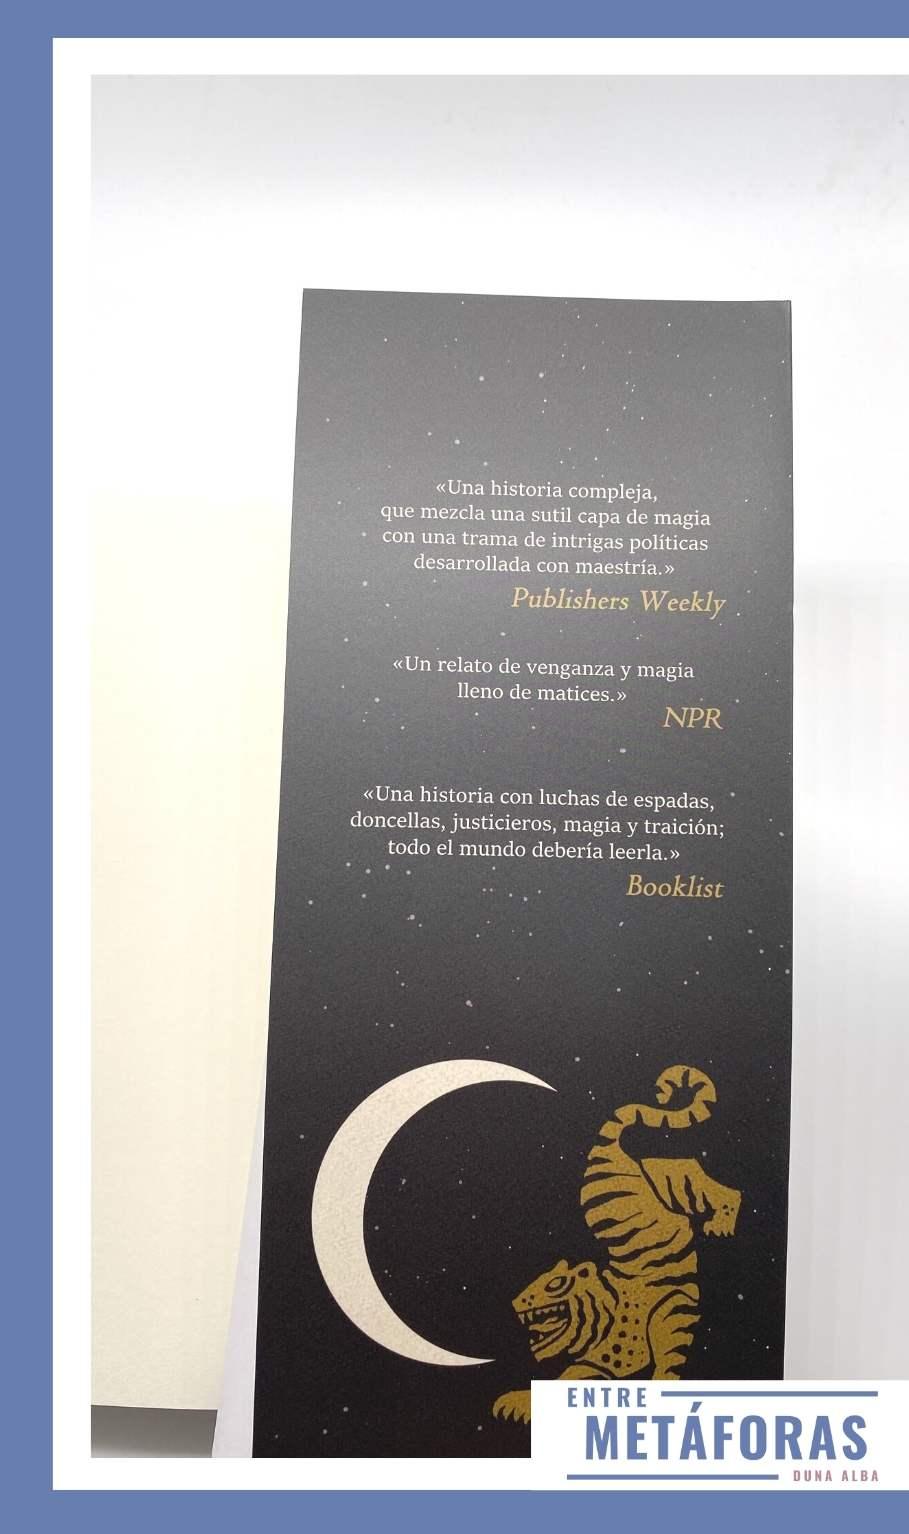 Magia a la luz de la luna, de Isabel Ibañez